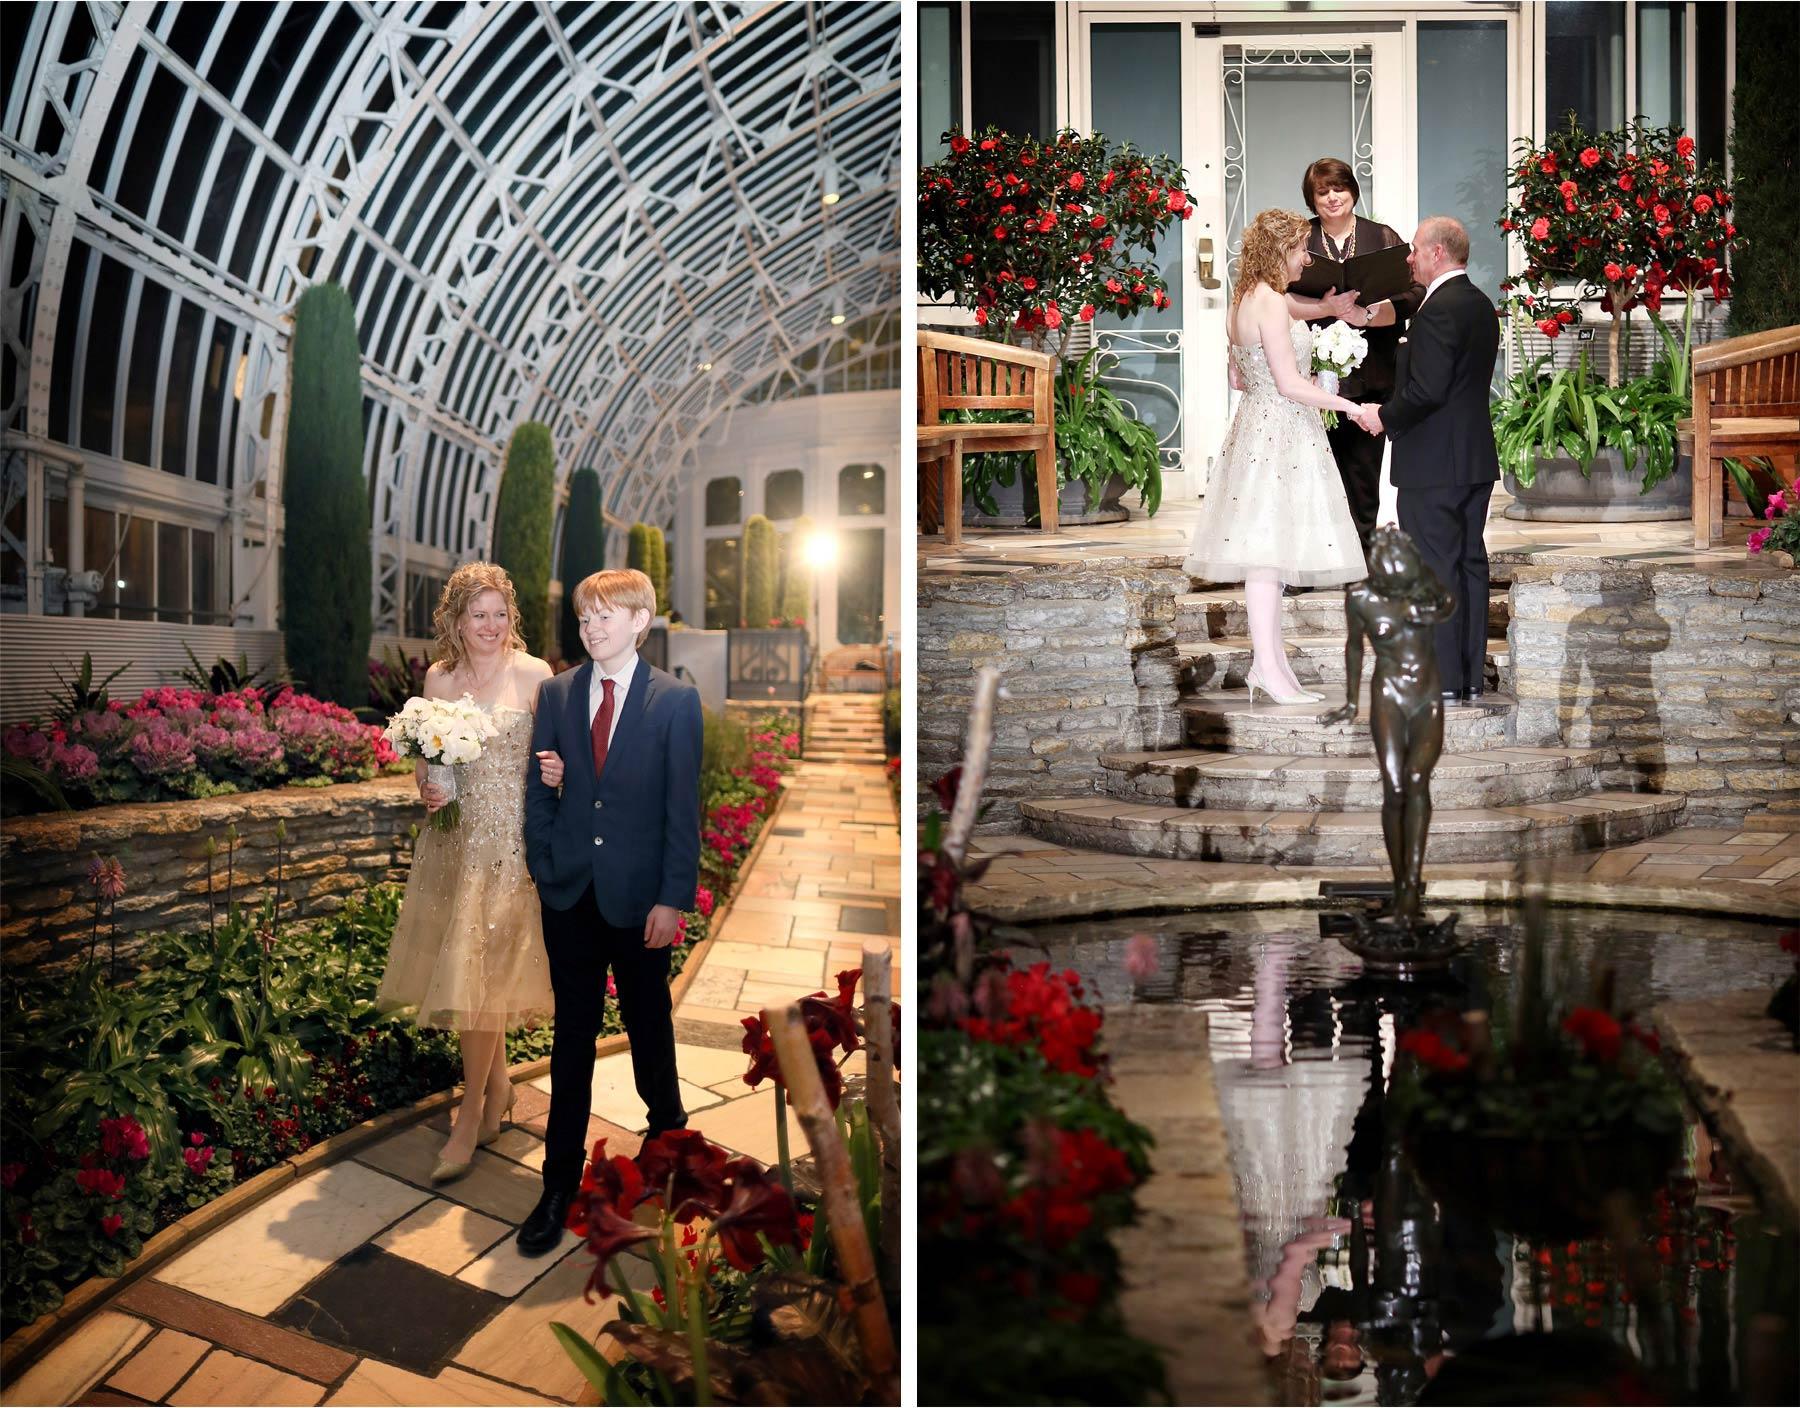 11-Saint-Paul-Minnesota-Wedding-Photographer-by-Andrew-Vick-Photography-Winter-Como-Park-Conservatory-Sunken-Garden-Ceremony-Bride-Groom-Son-Family-Processional-Flowers-Night-Dannette-and-Darren.jpg